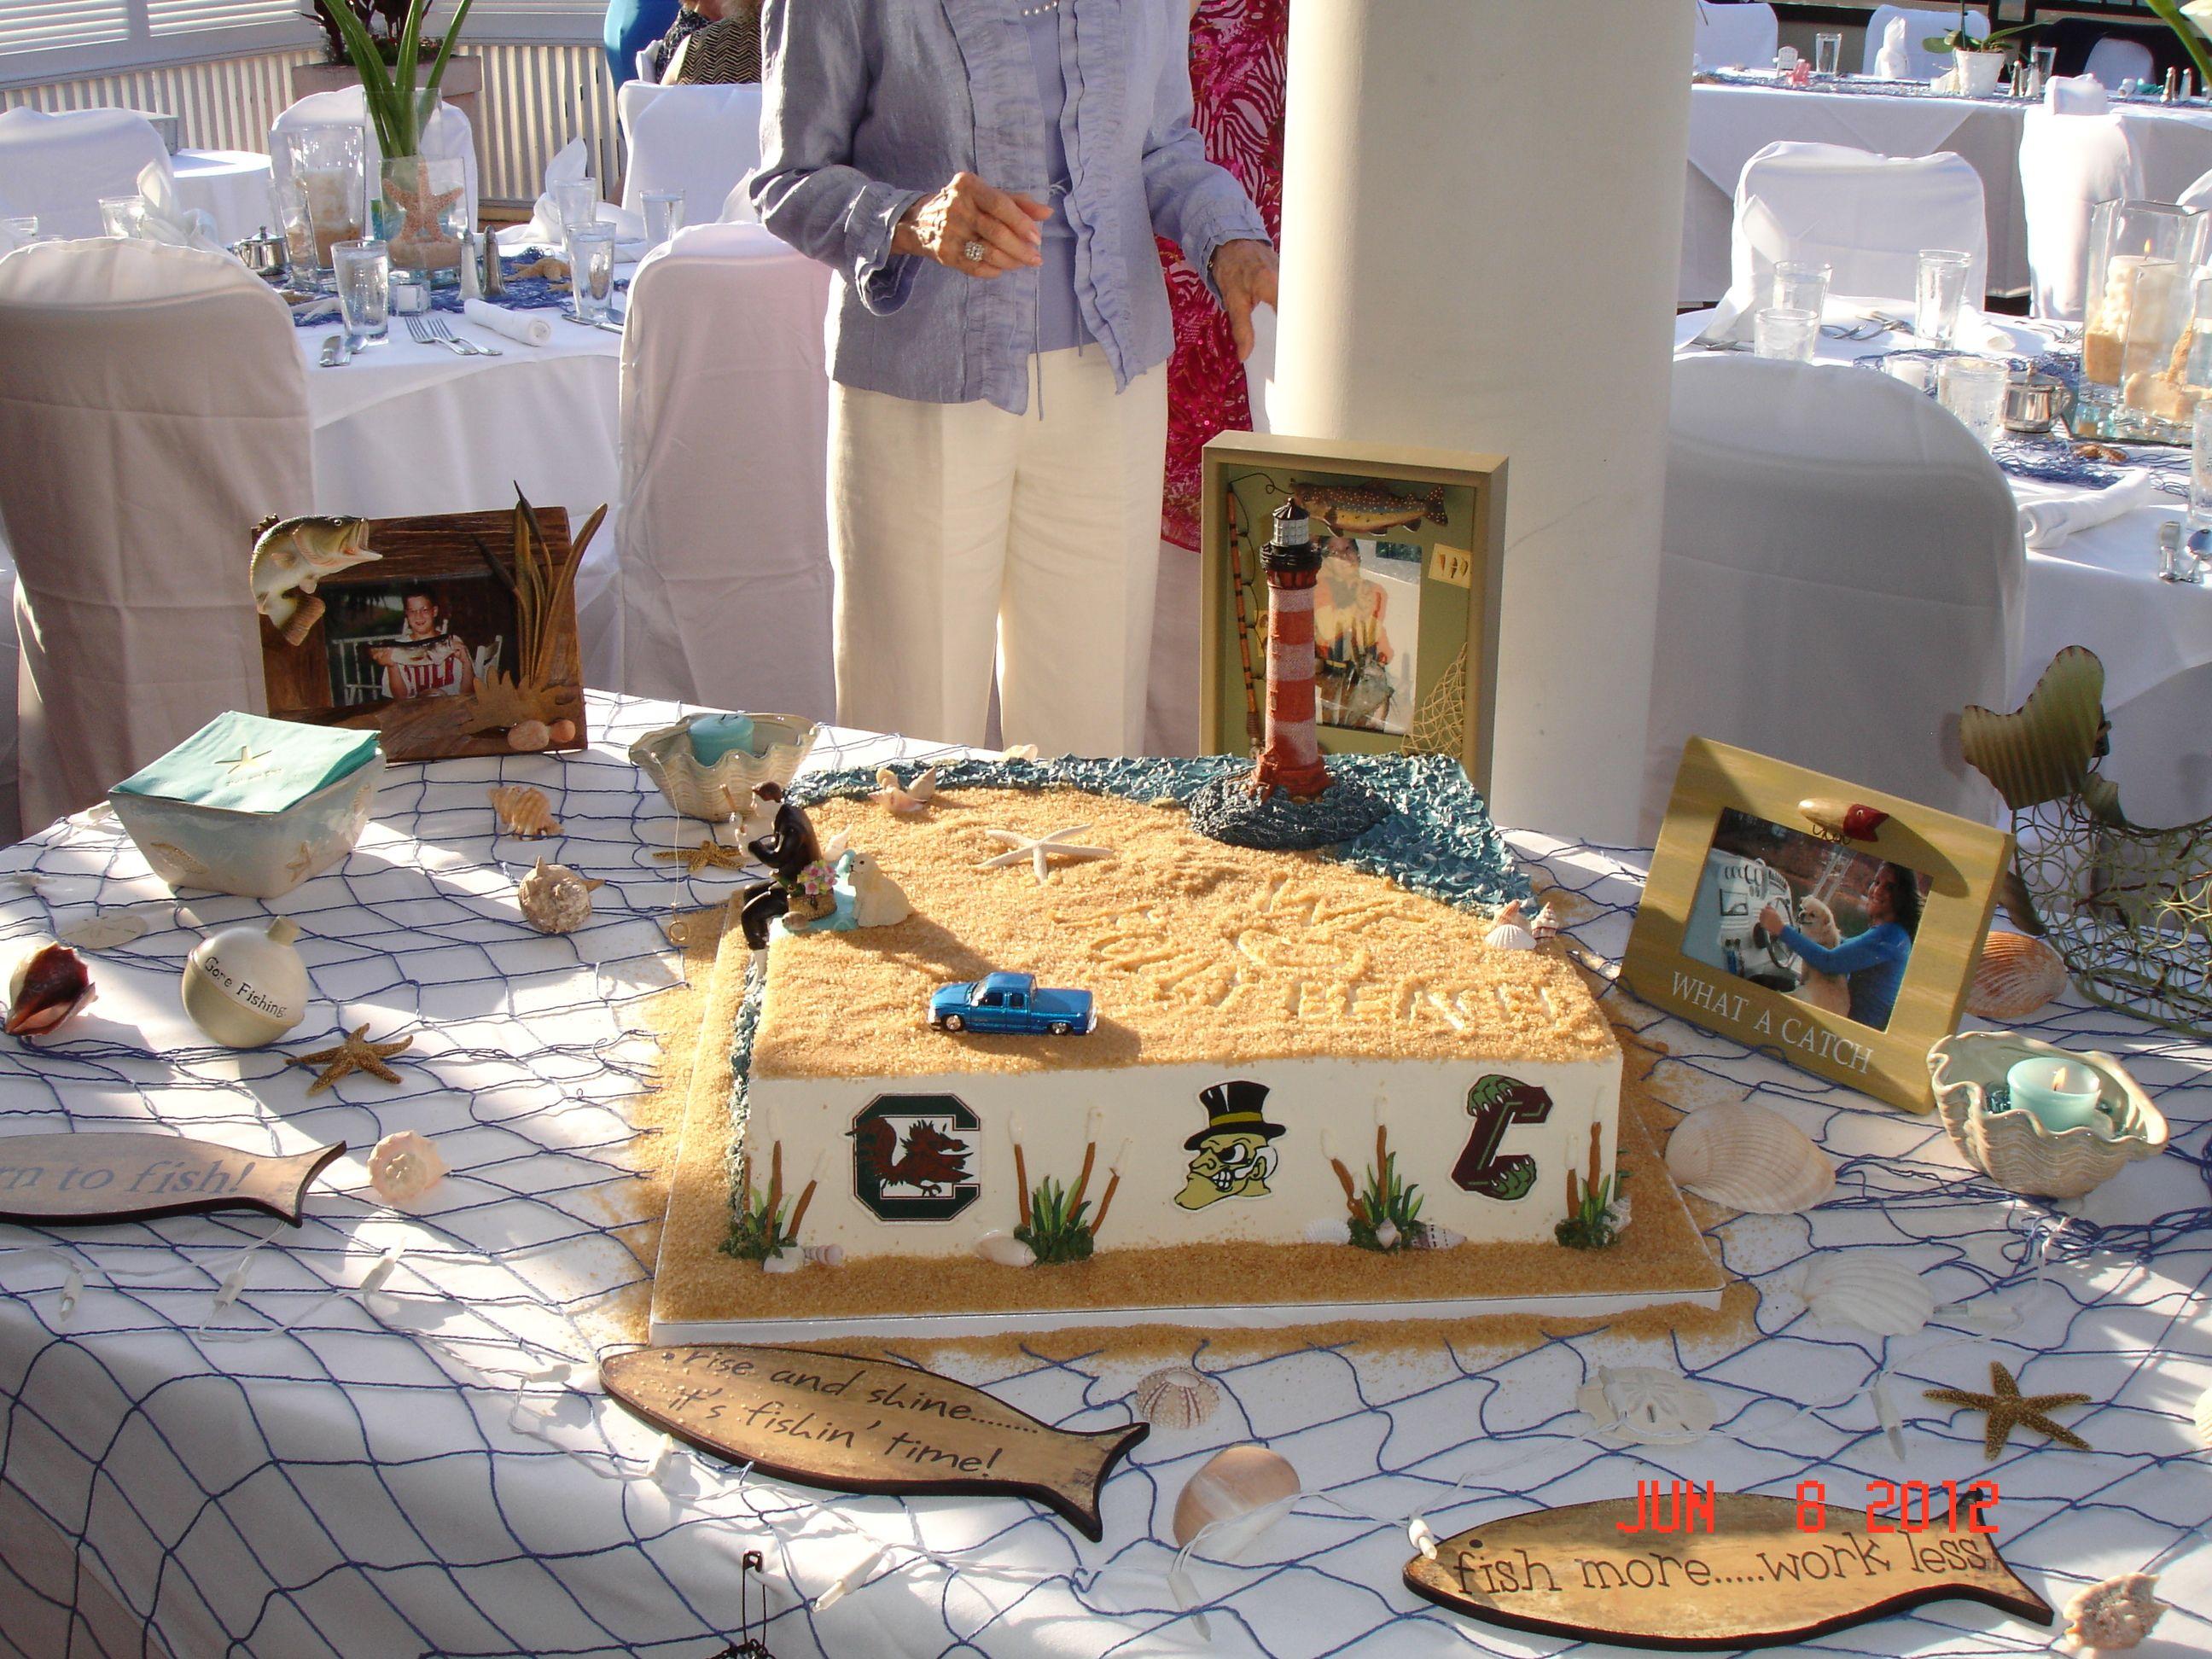 The Cake Stand Folly Beach